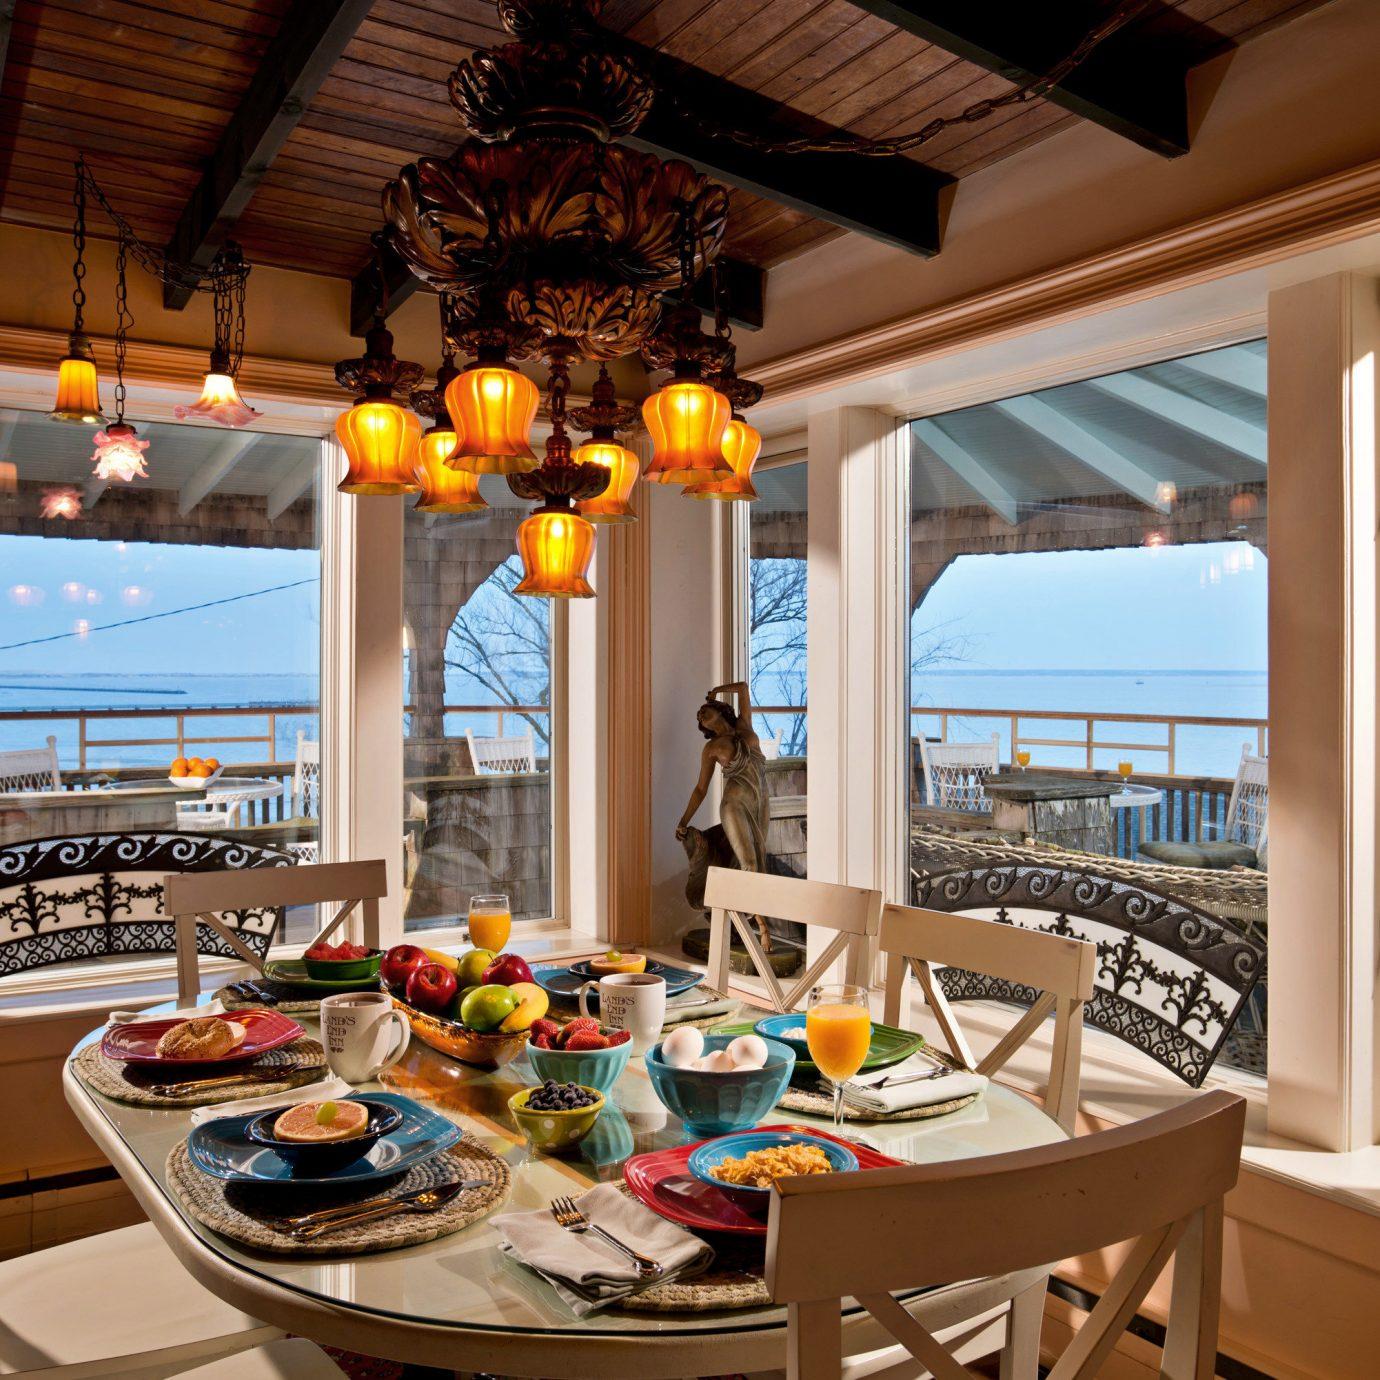 Dining Drink Eat Inn Lounge Scenic views Resort home restaurant caribbean Island